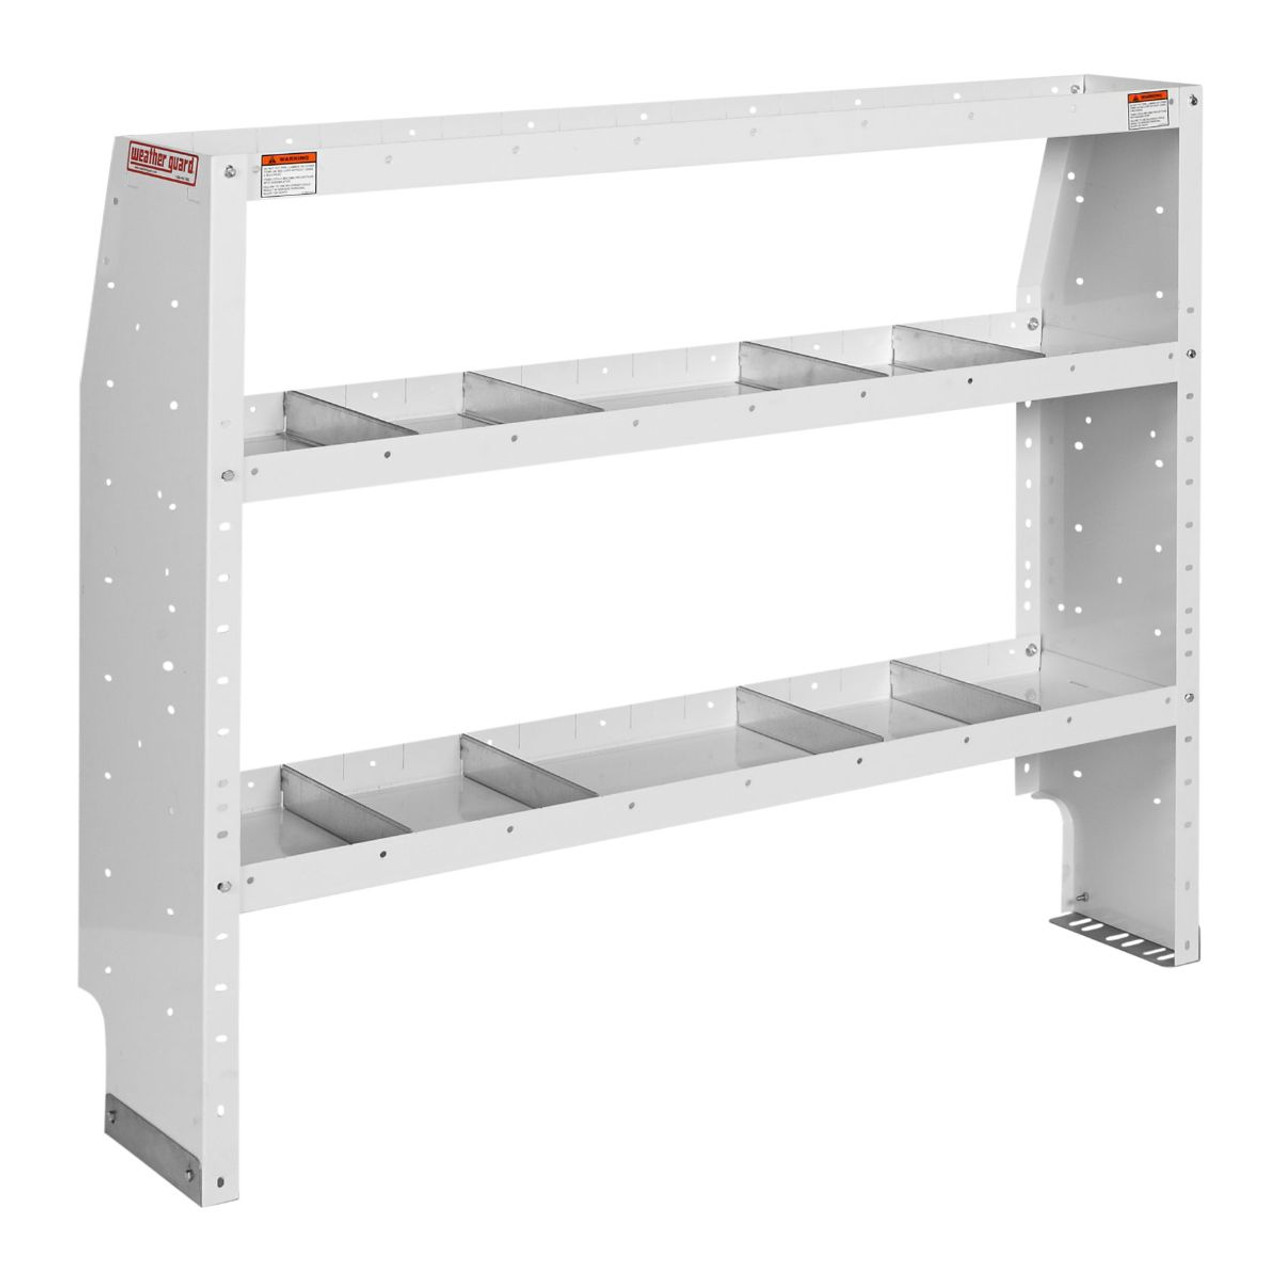 Weatherguard Accessory Shelf 52in x 13.5in